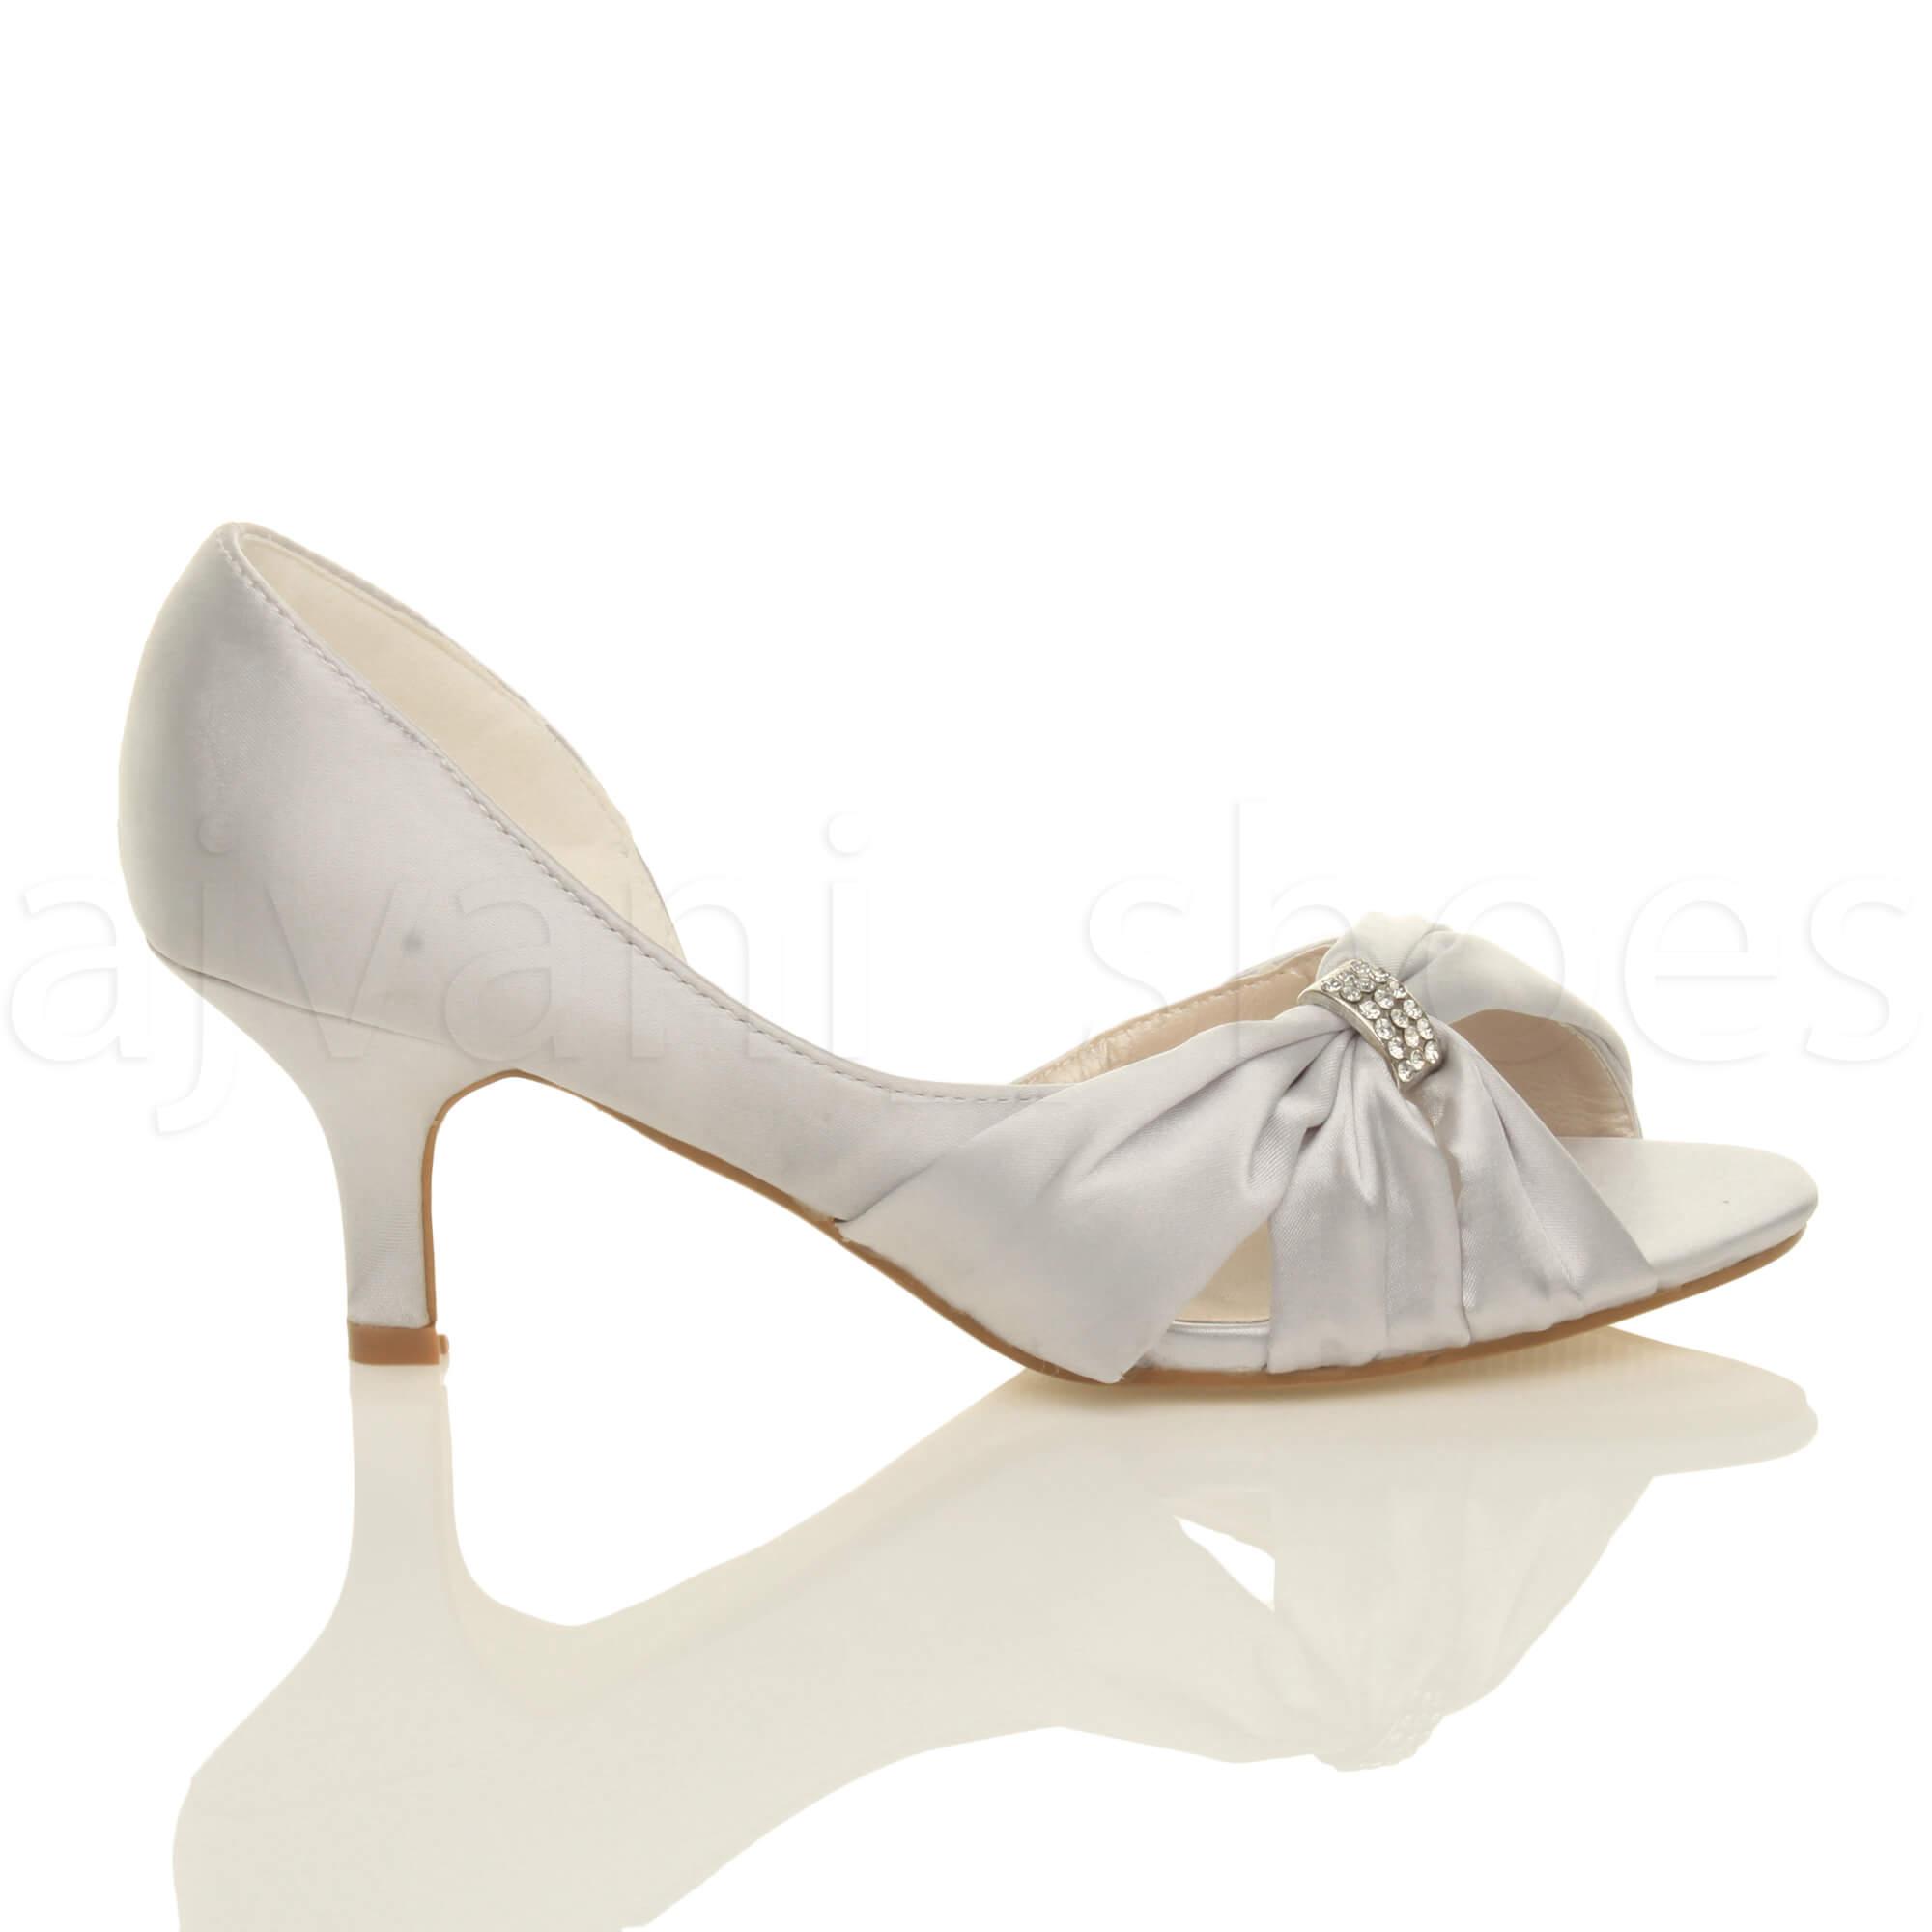 WOMENS-LADIES-WEDDING-EVENING-LOW-KITTEN-HEEL-PEEPTOE-SHOES-SANDALS-SIZE thumbnail 13